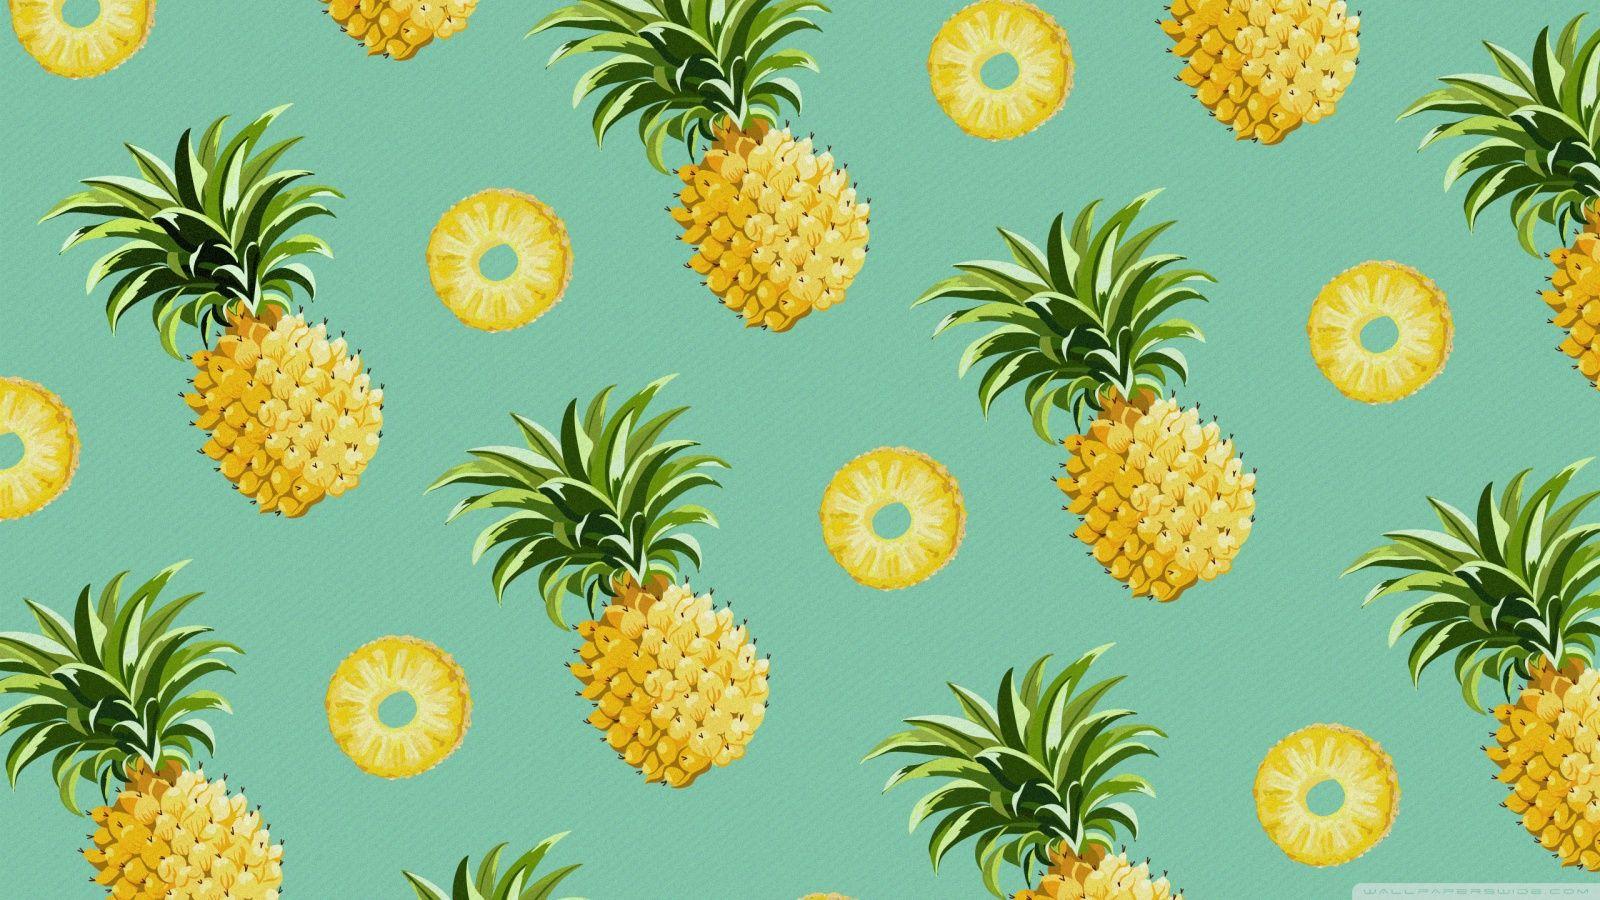 Cool Pineapples Pineapple Wallpaper Pineapple Cute Wallpaper For Phone